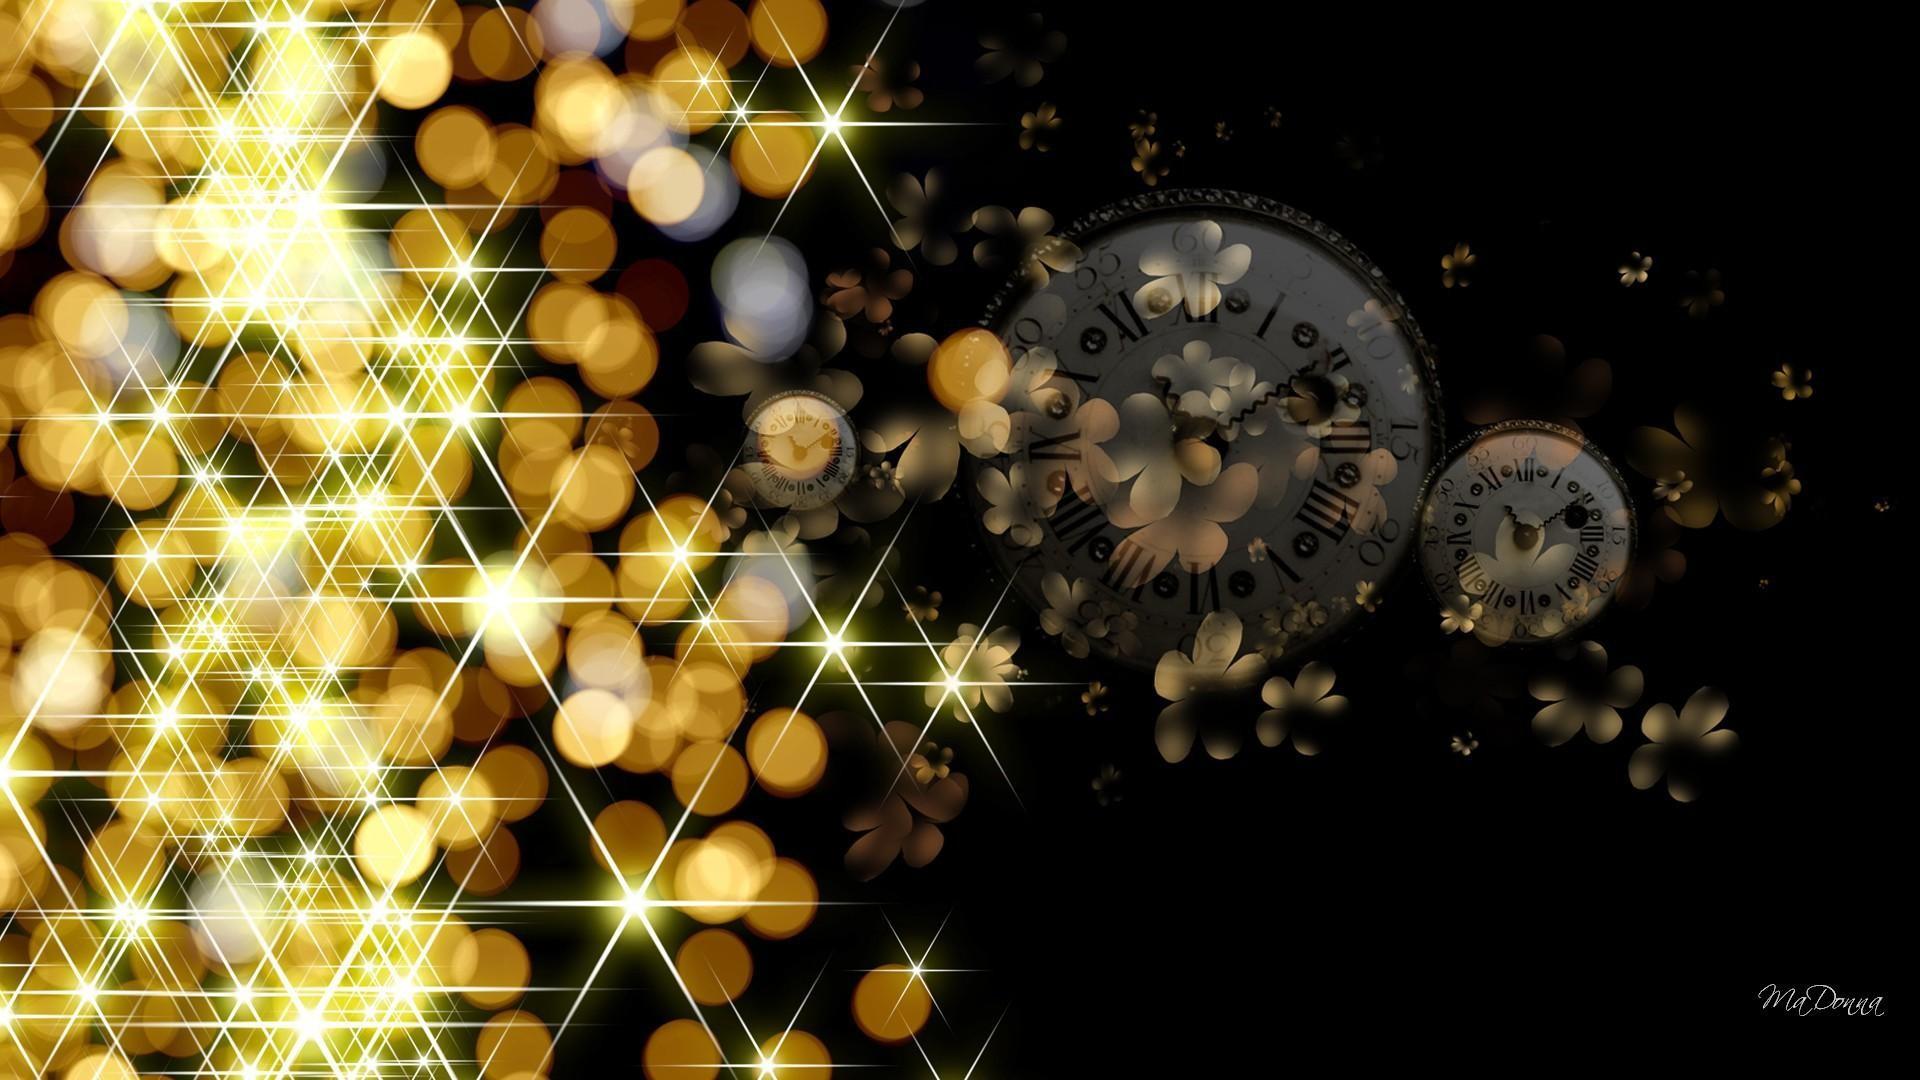 Gallery for Black And Gold Glitter. Black and Gold Desktop Wallpaper:  Wallpapers for Gt Black Gold Glitter Wallpaper